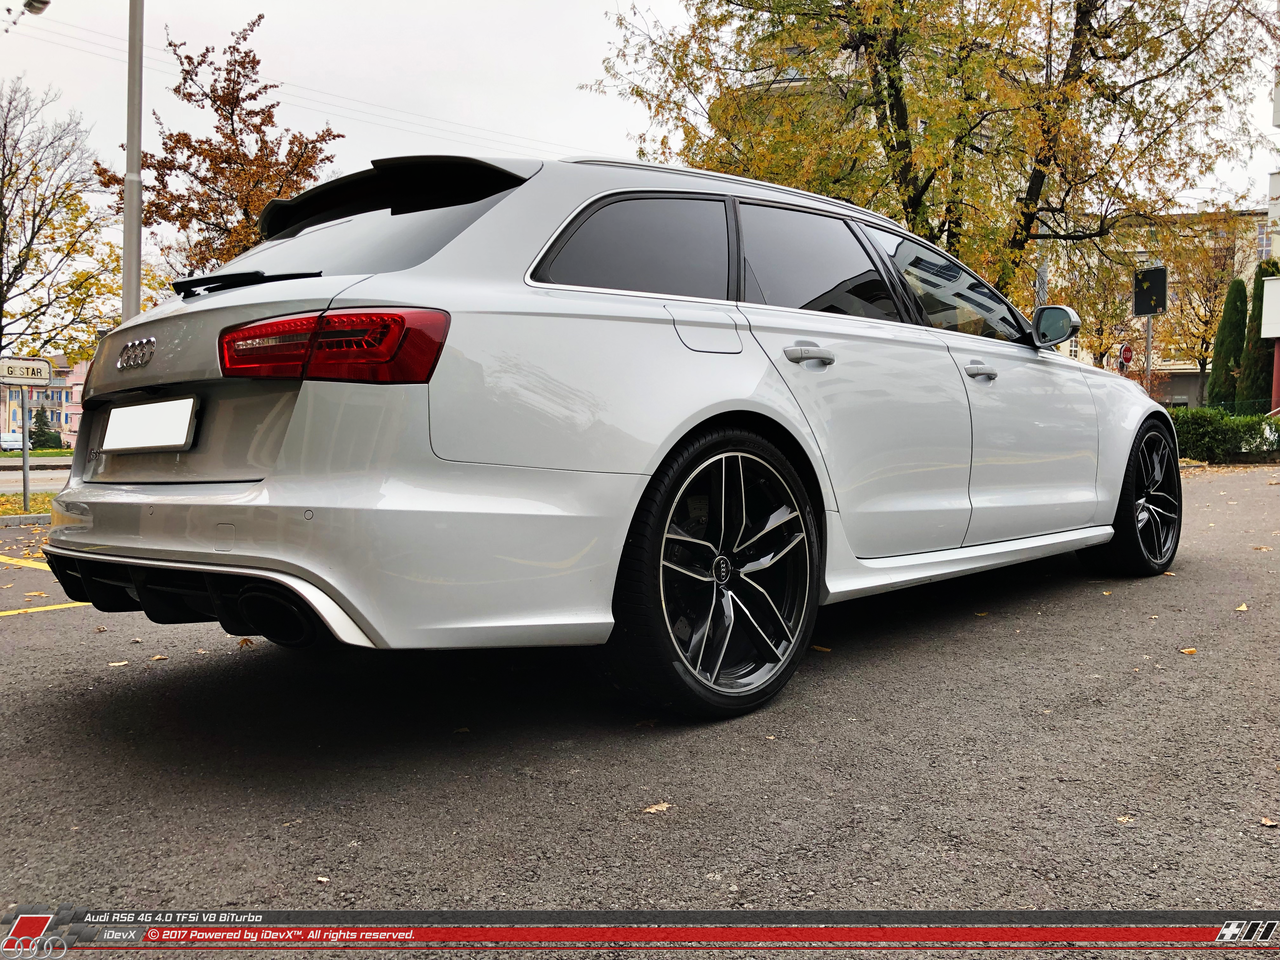 10_11.2018_Audi-RS6_iDevX_023.png